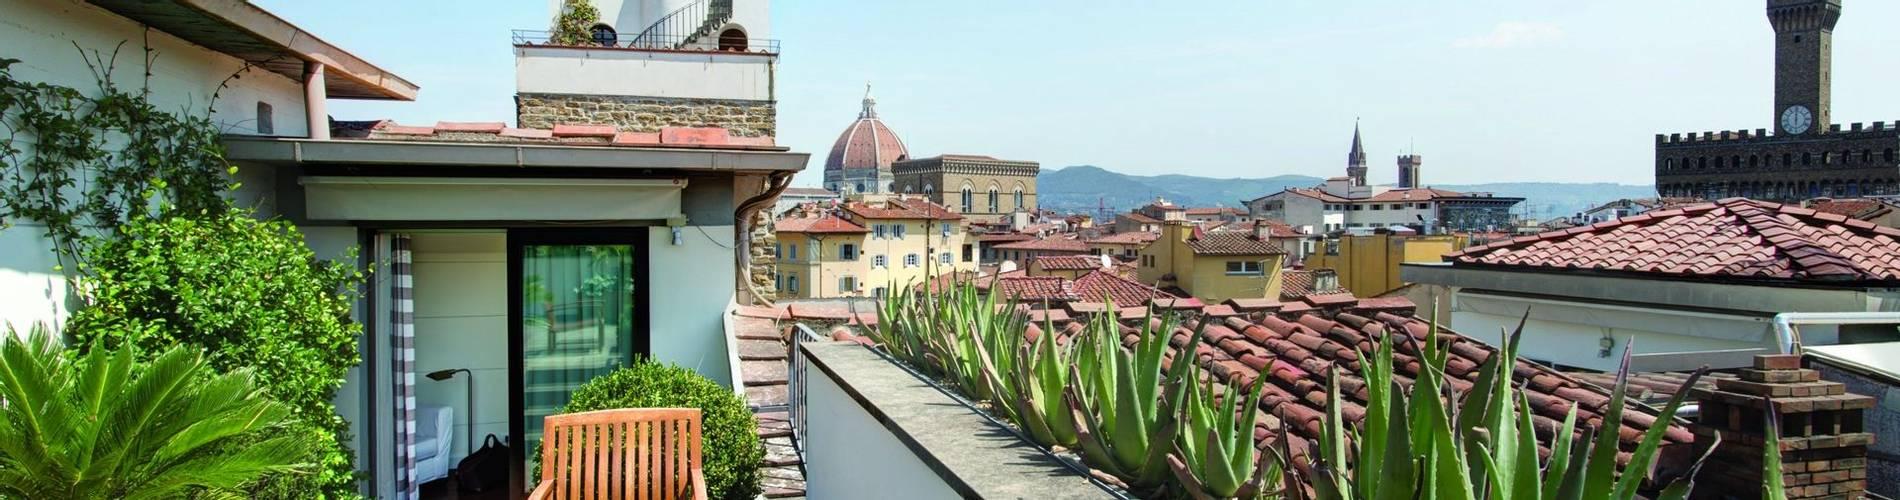 Gallery Art Hotel, Tuscany, Italy, Penthouse Pitti (3).JPG